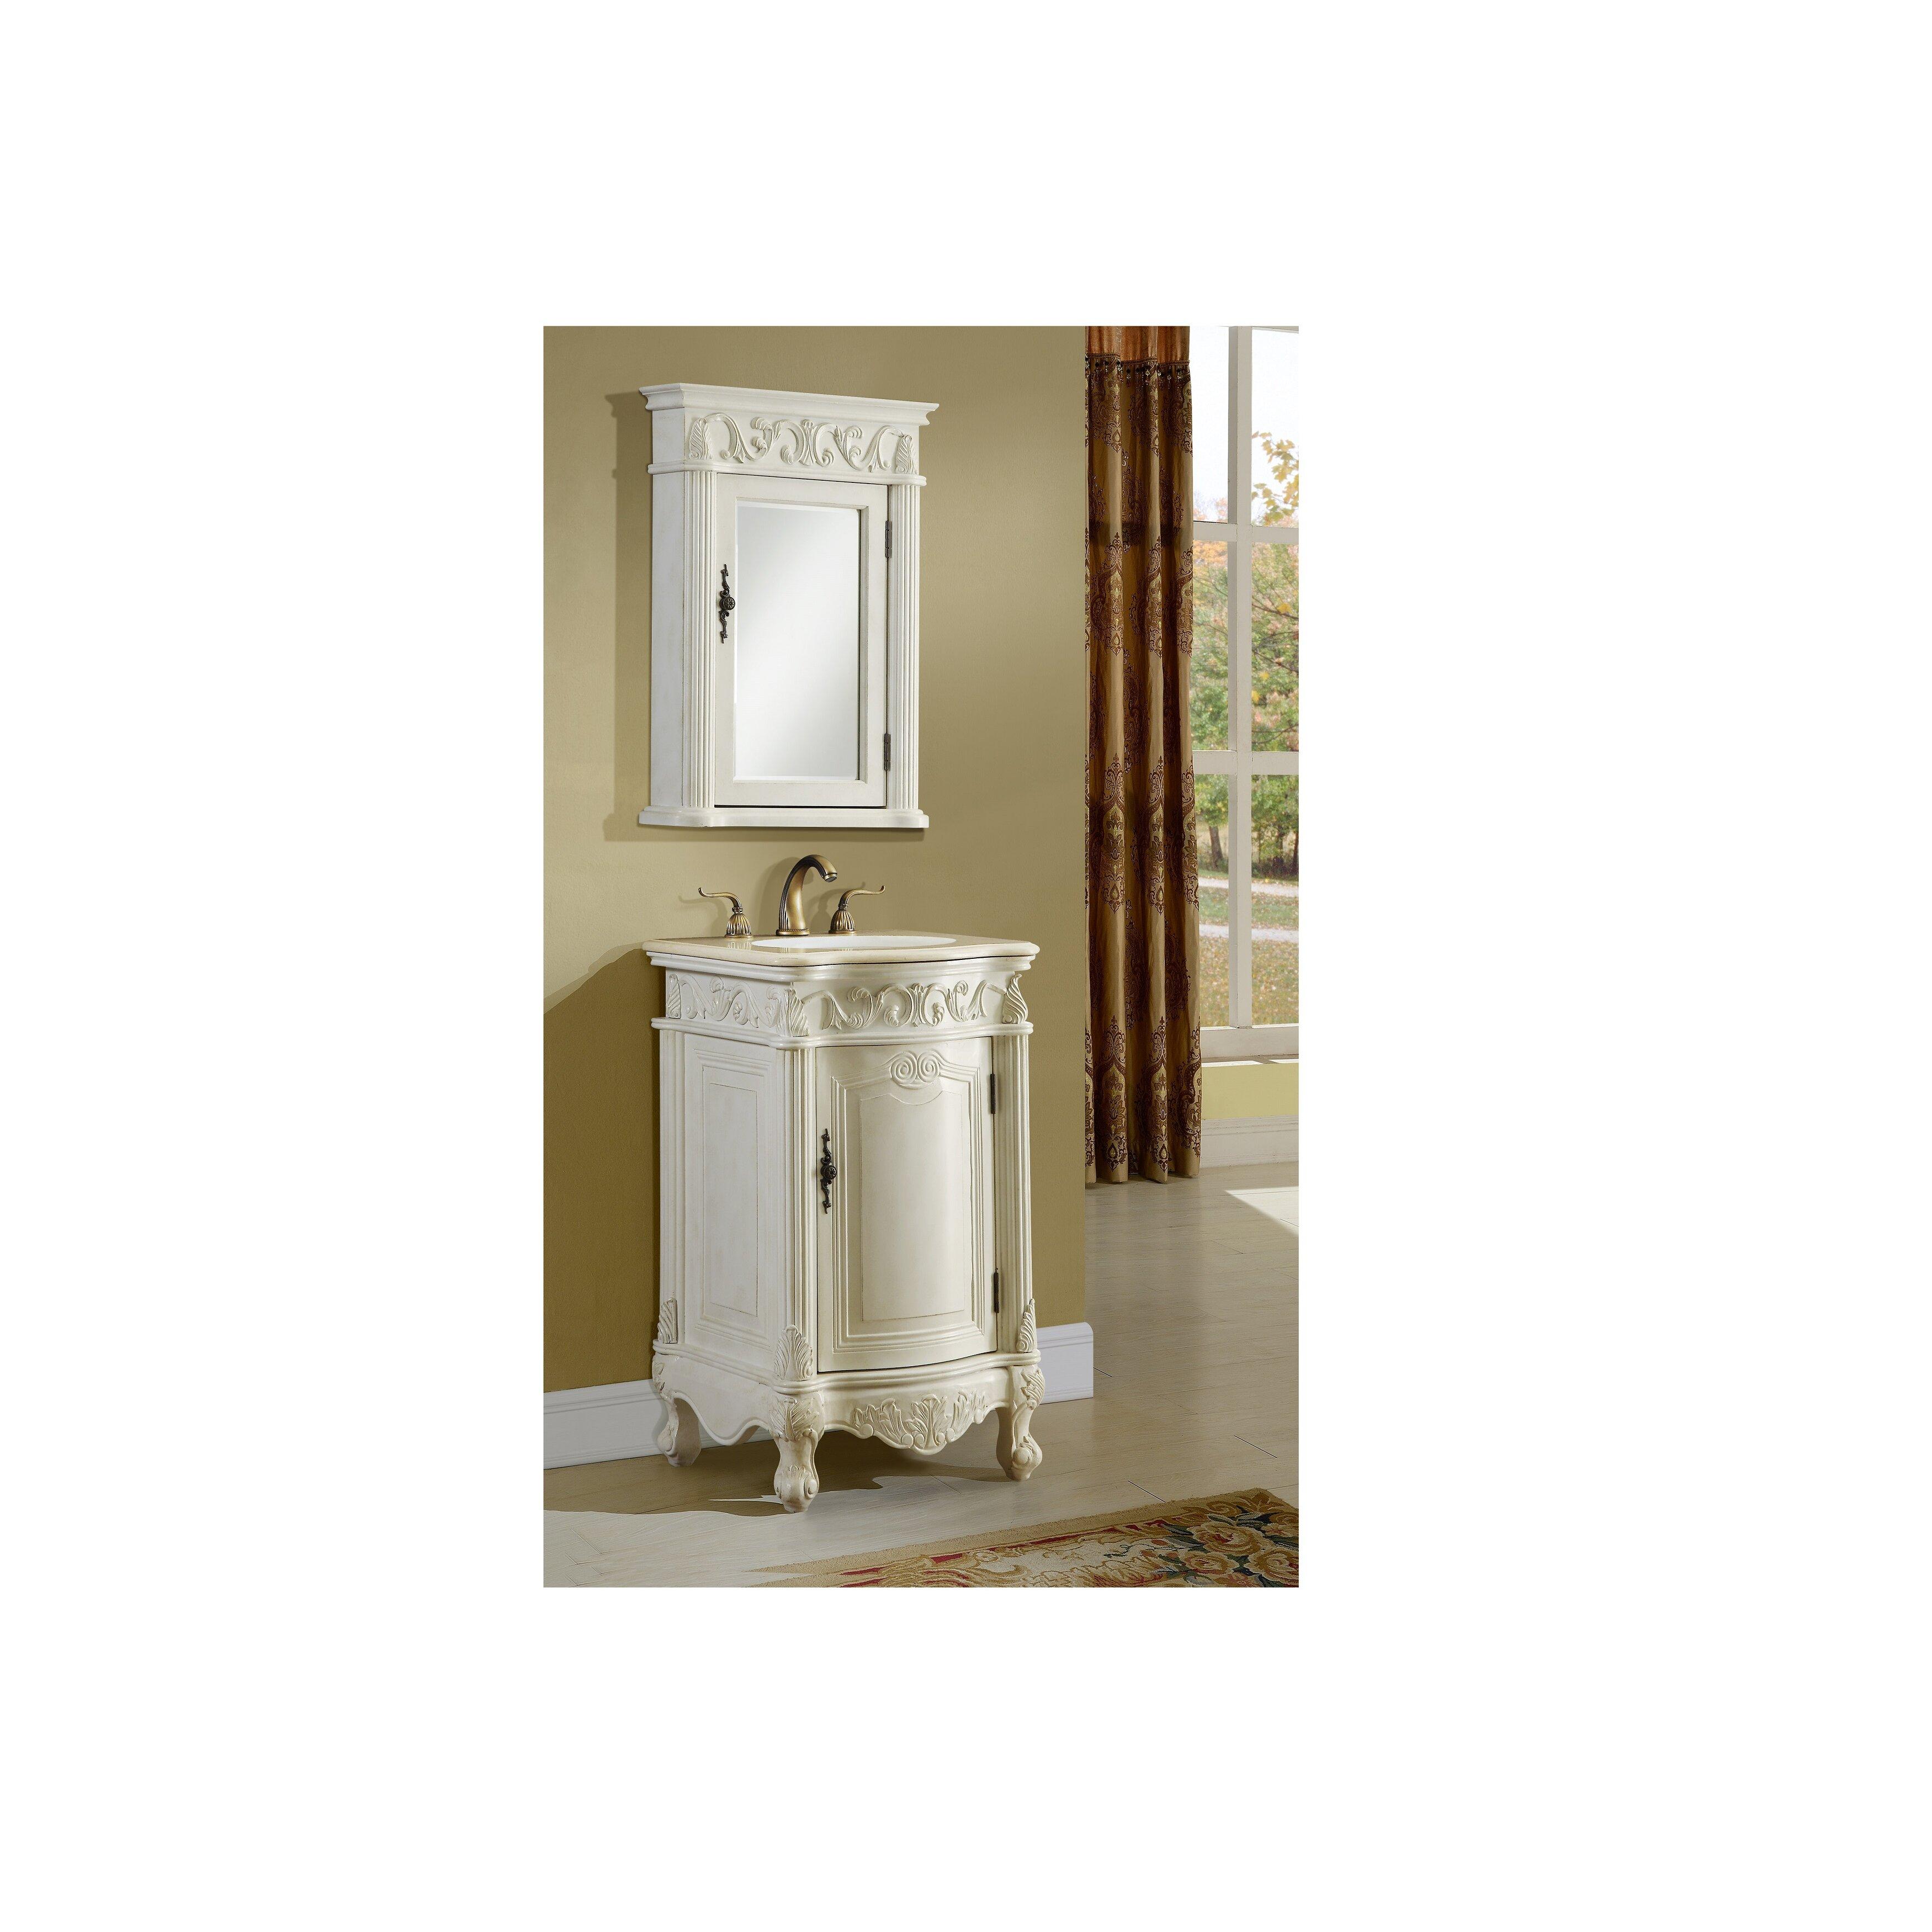 Rustic Bathroom Medicine Cabinets Specials For New York